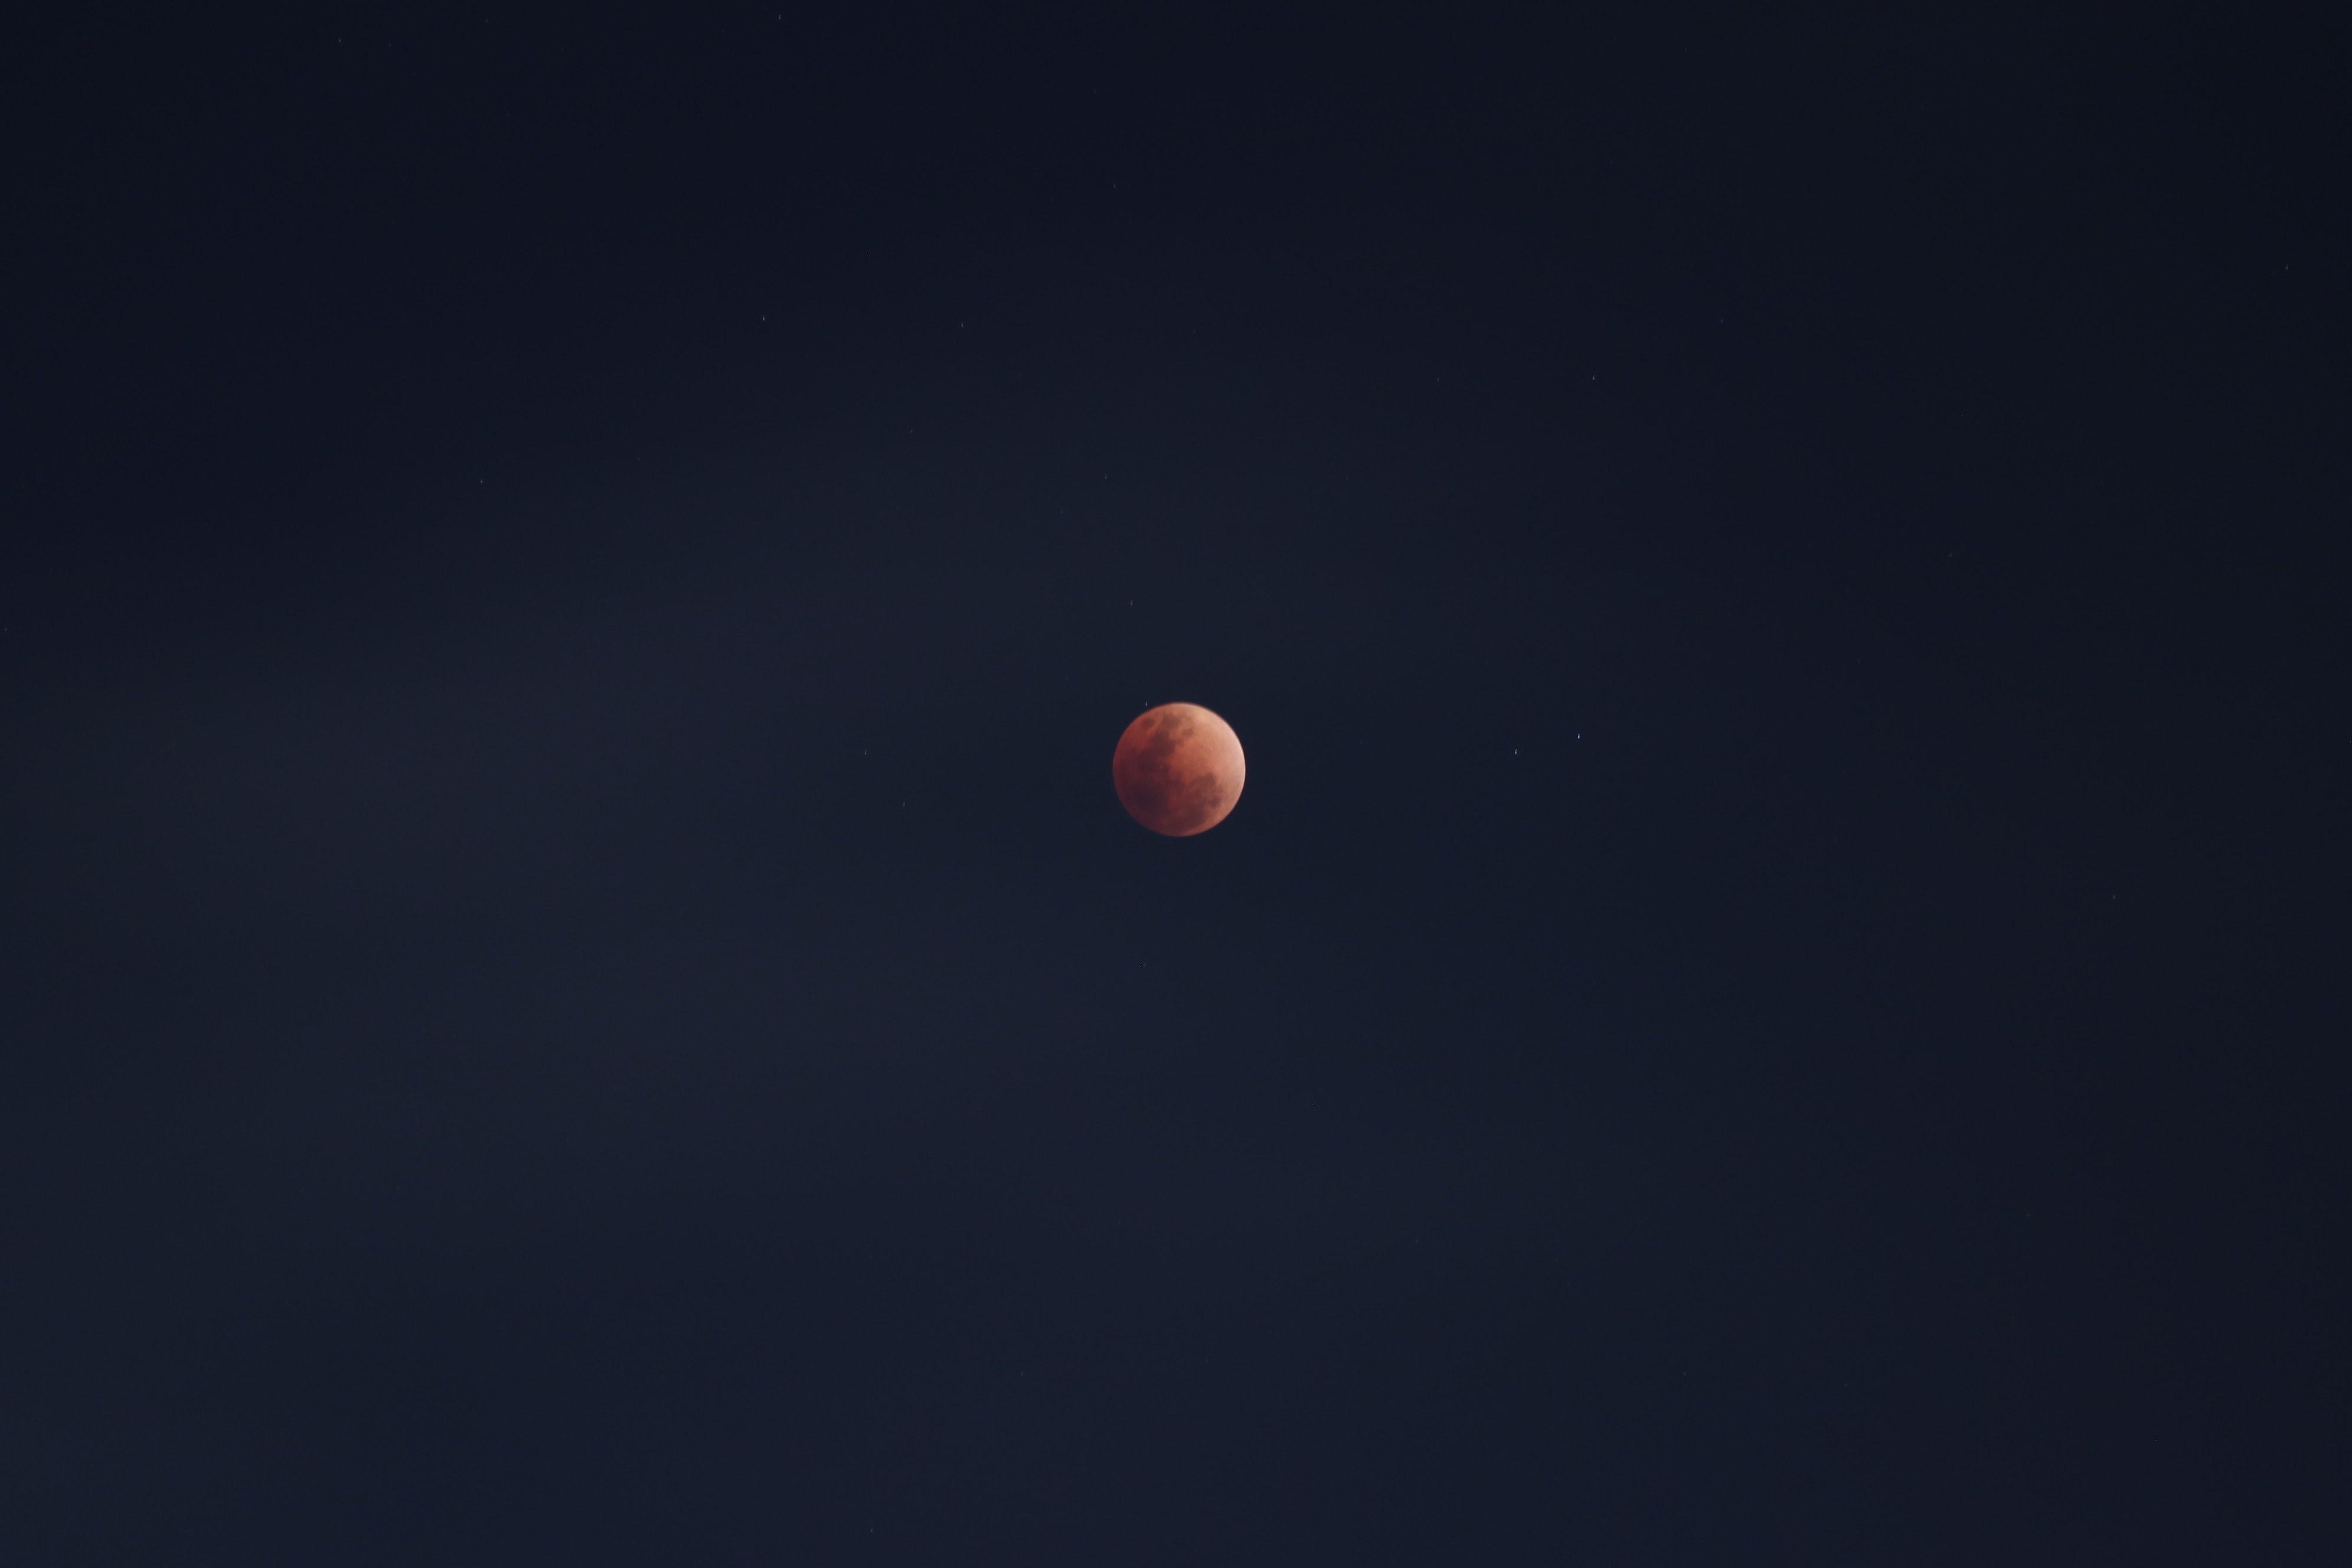 astronomy-dark-eclipse-838990